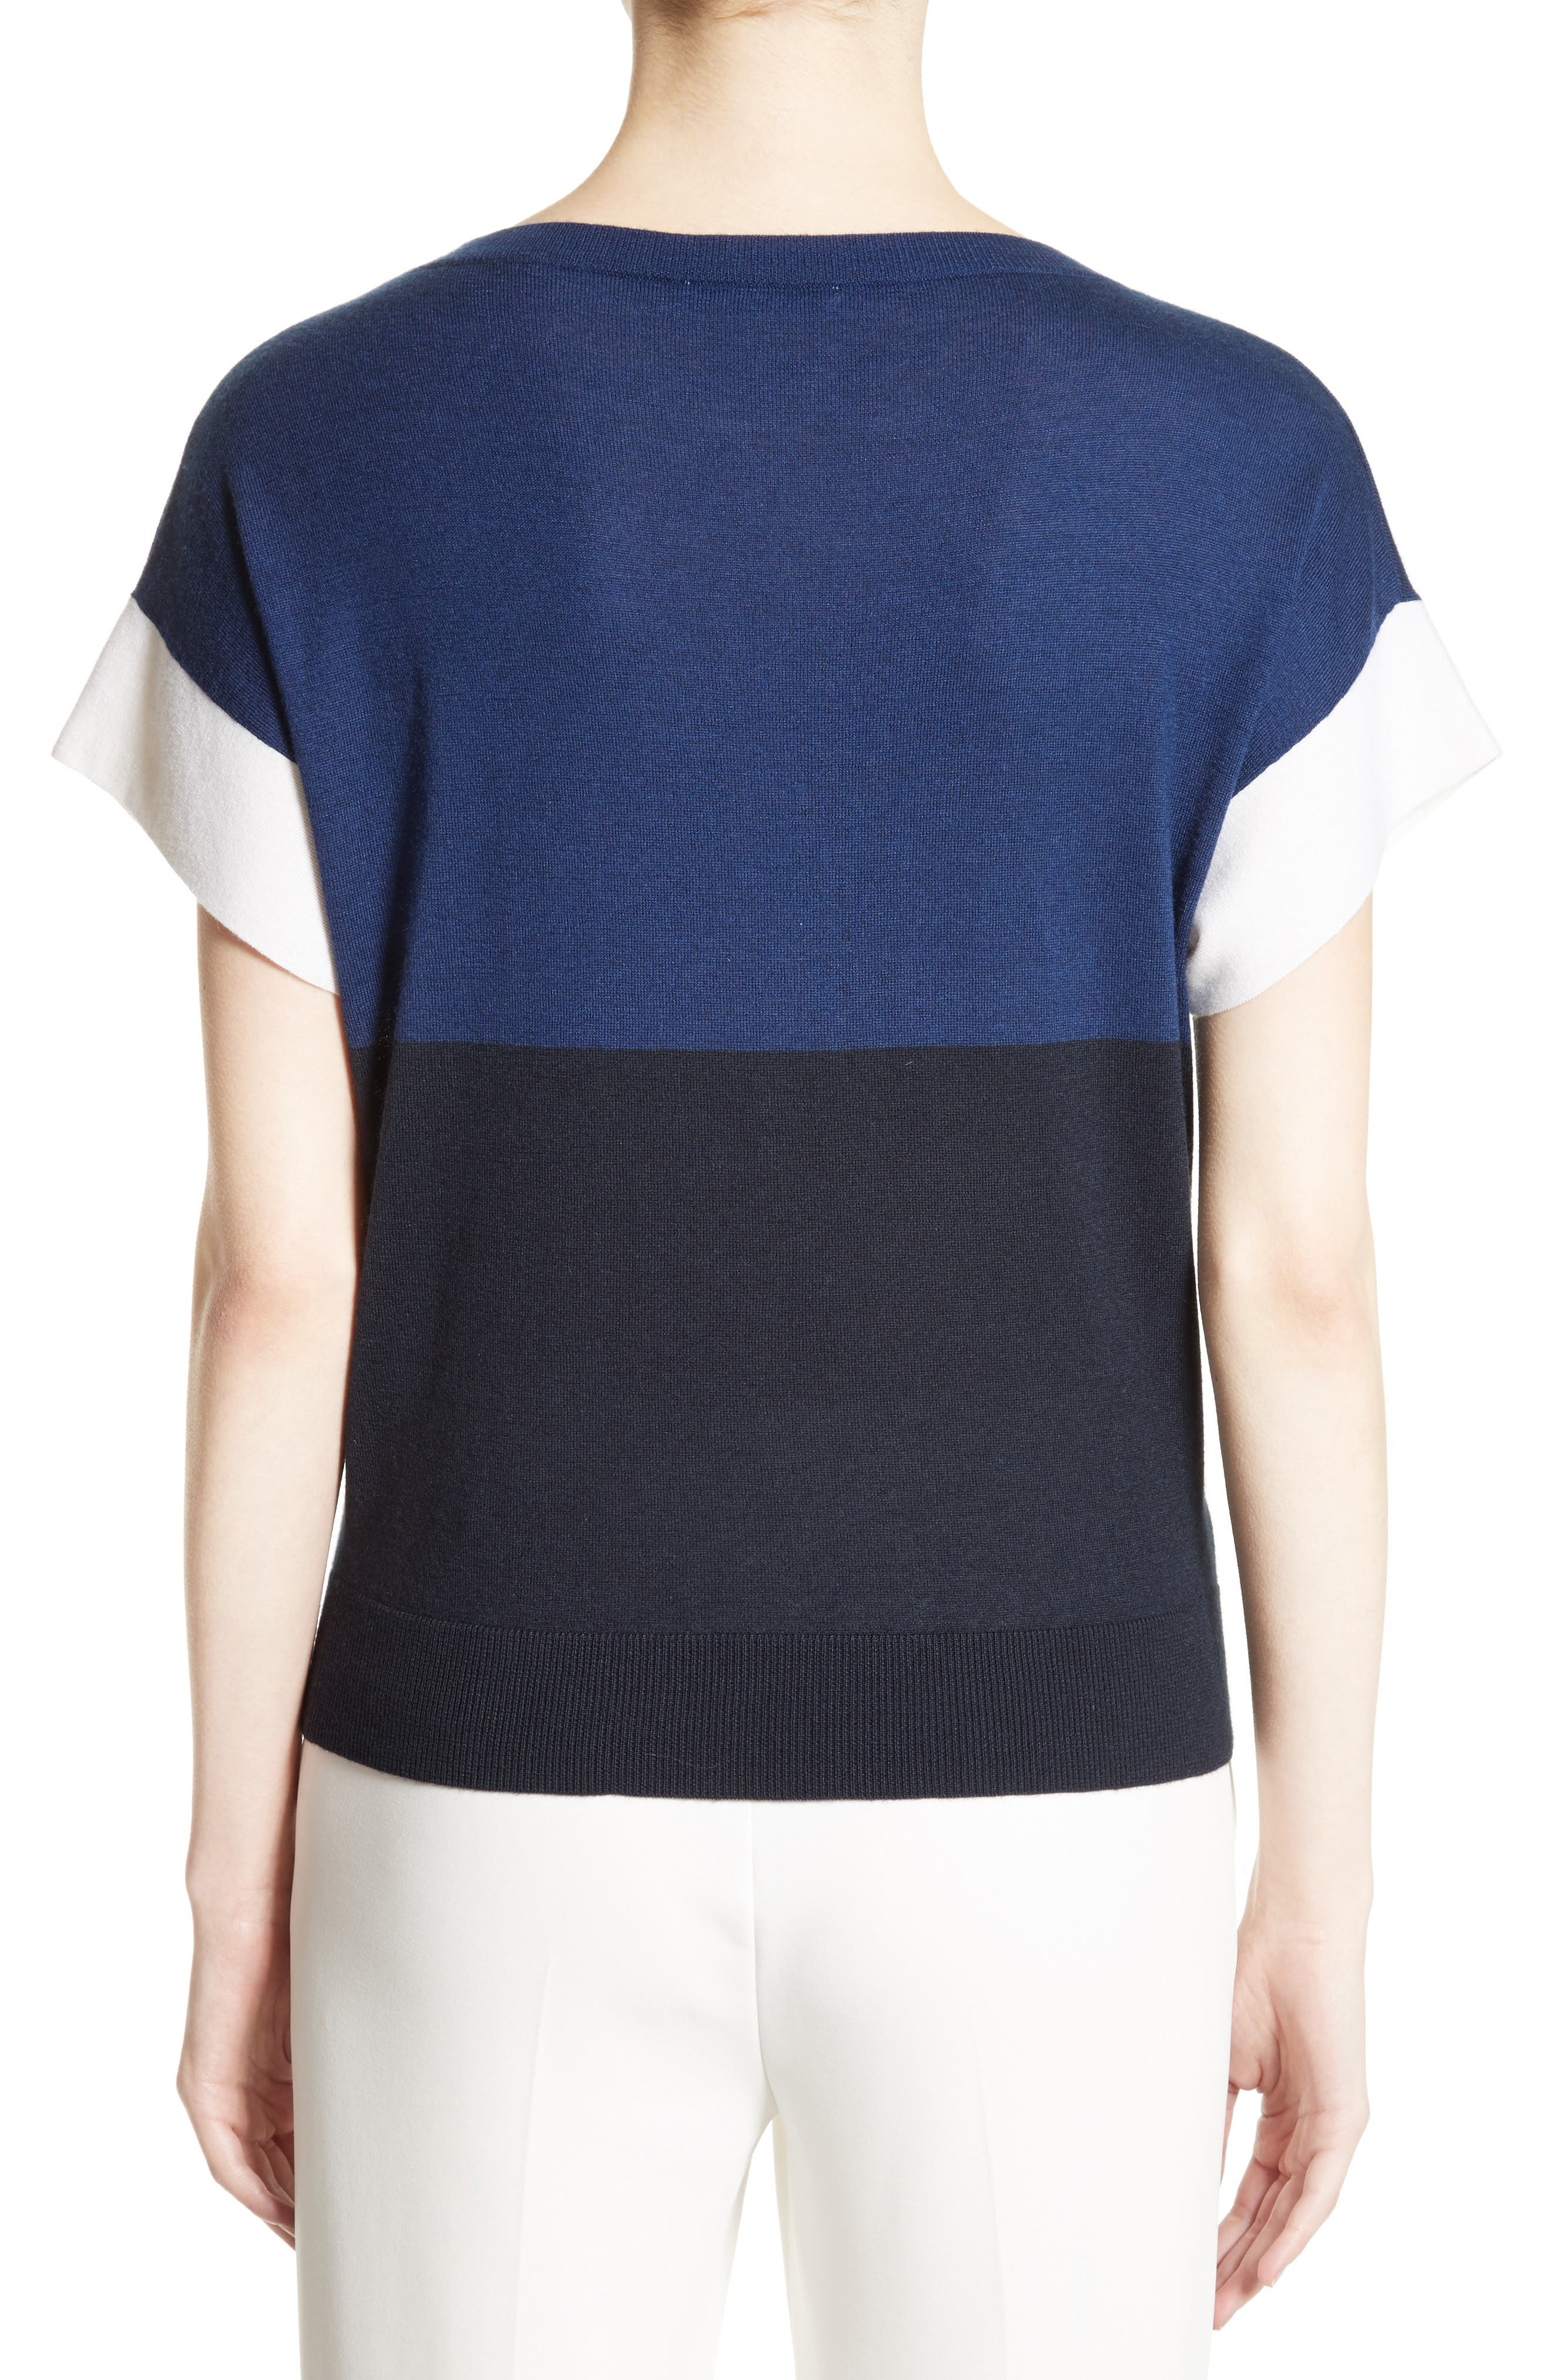 Colimbo Silk & Cashmere Top,                             Alternate thumbnail 2, color,                             Ultra Marine